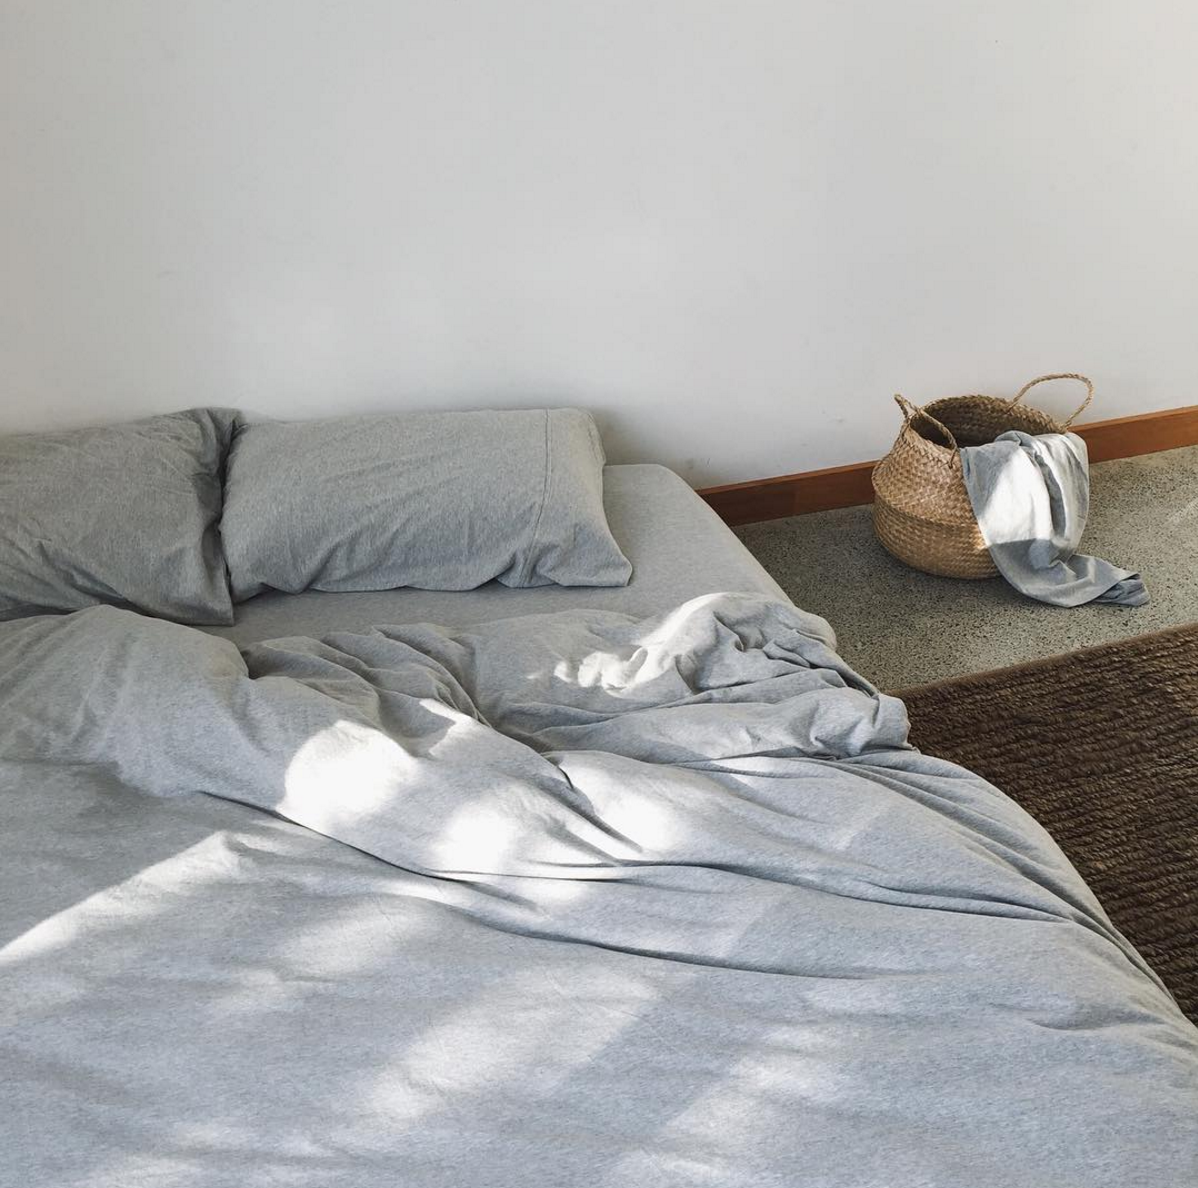 dehei-bedding-grey-marle-bedding-remodelista-1